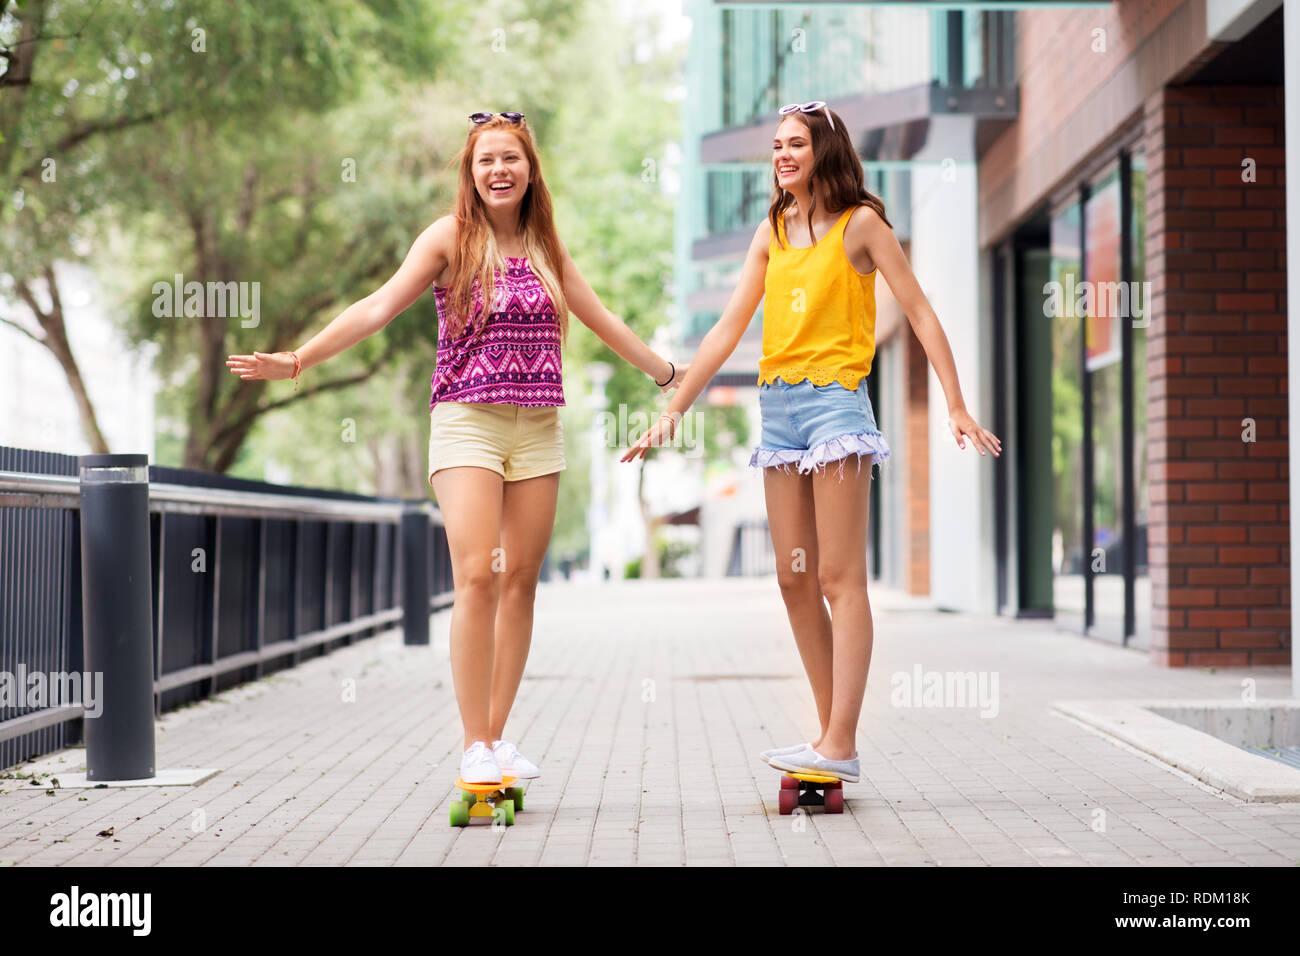 08dfad80 teenage girls riding skateboards in city Stock Photo: 232165379 - Alamy